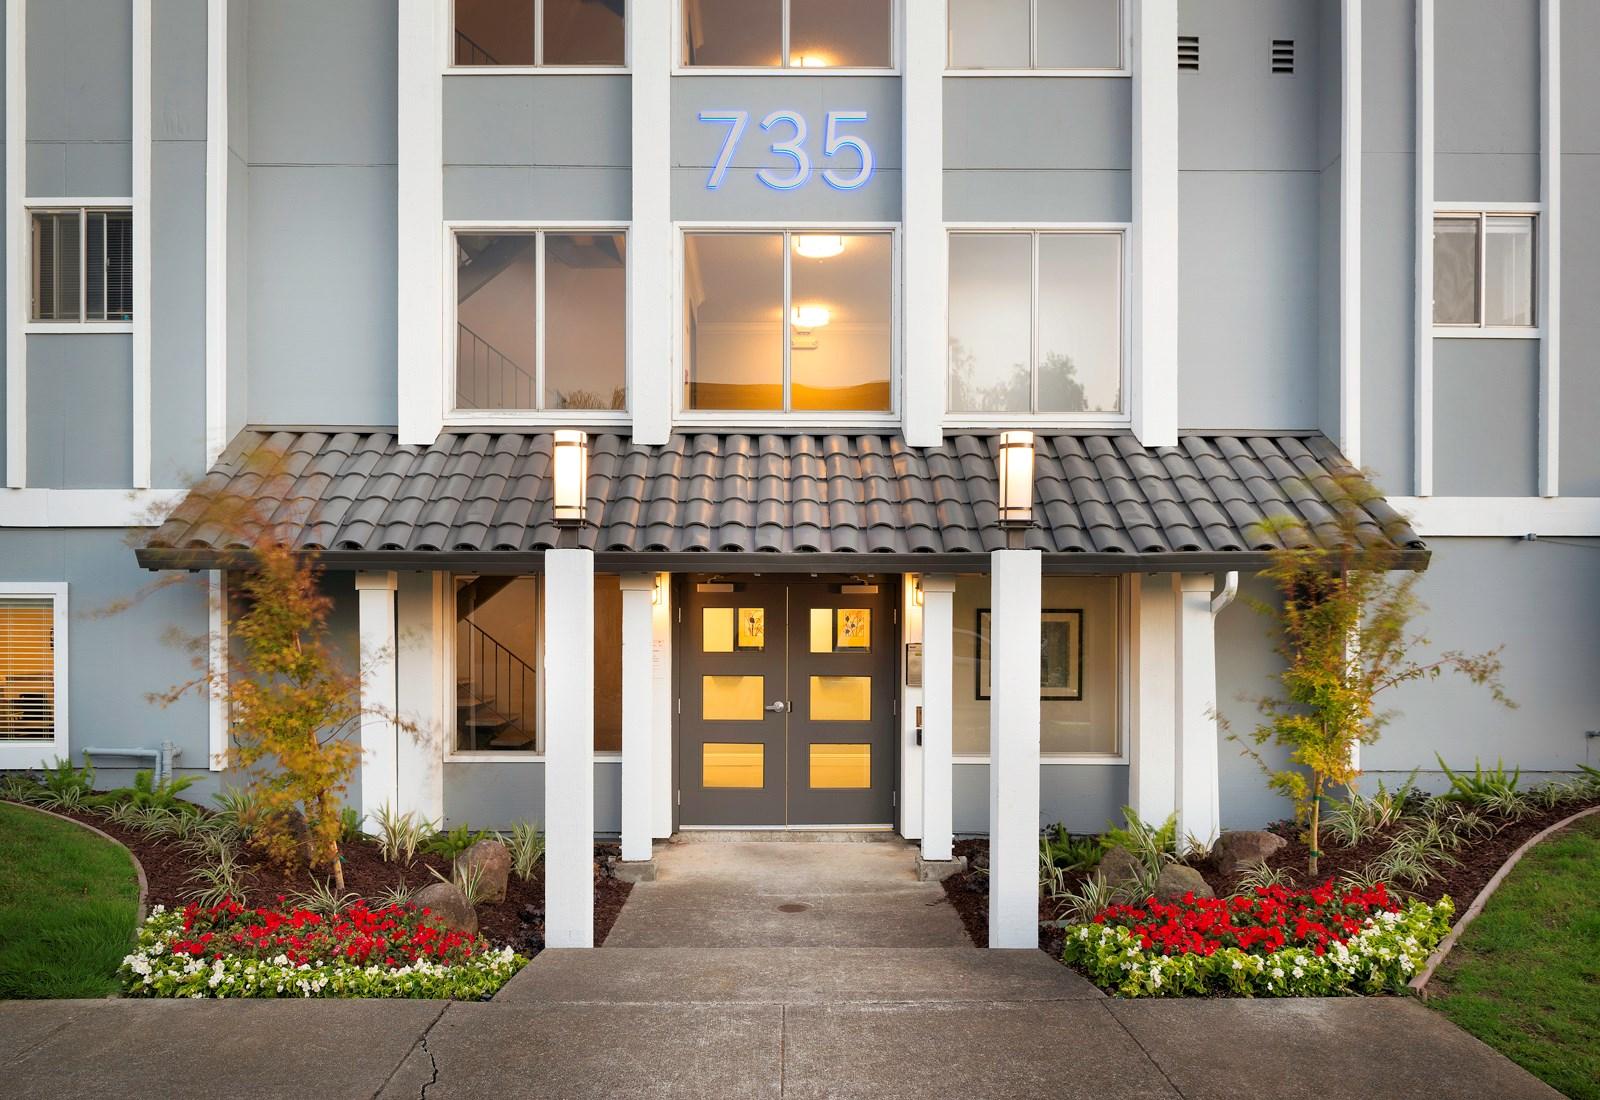 apartment reviews and rankings rentlingo. Black Bedroom Furniture Sets. Home Design Ideas